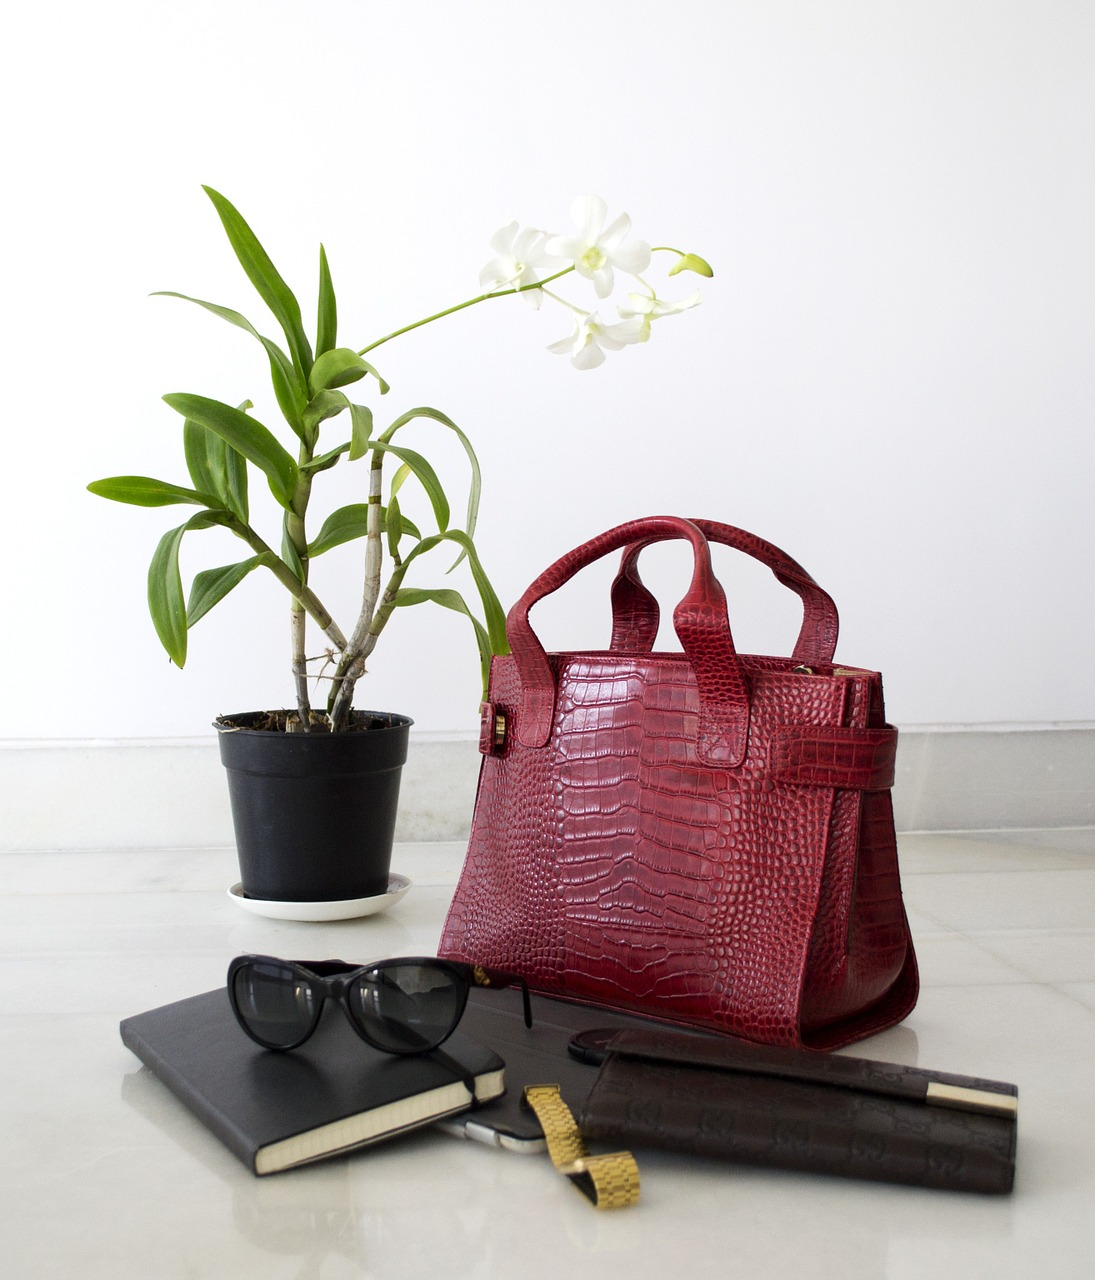 Domodi damskie torebki